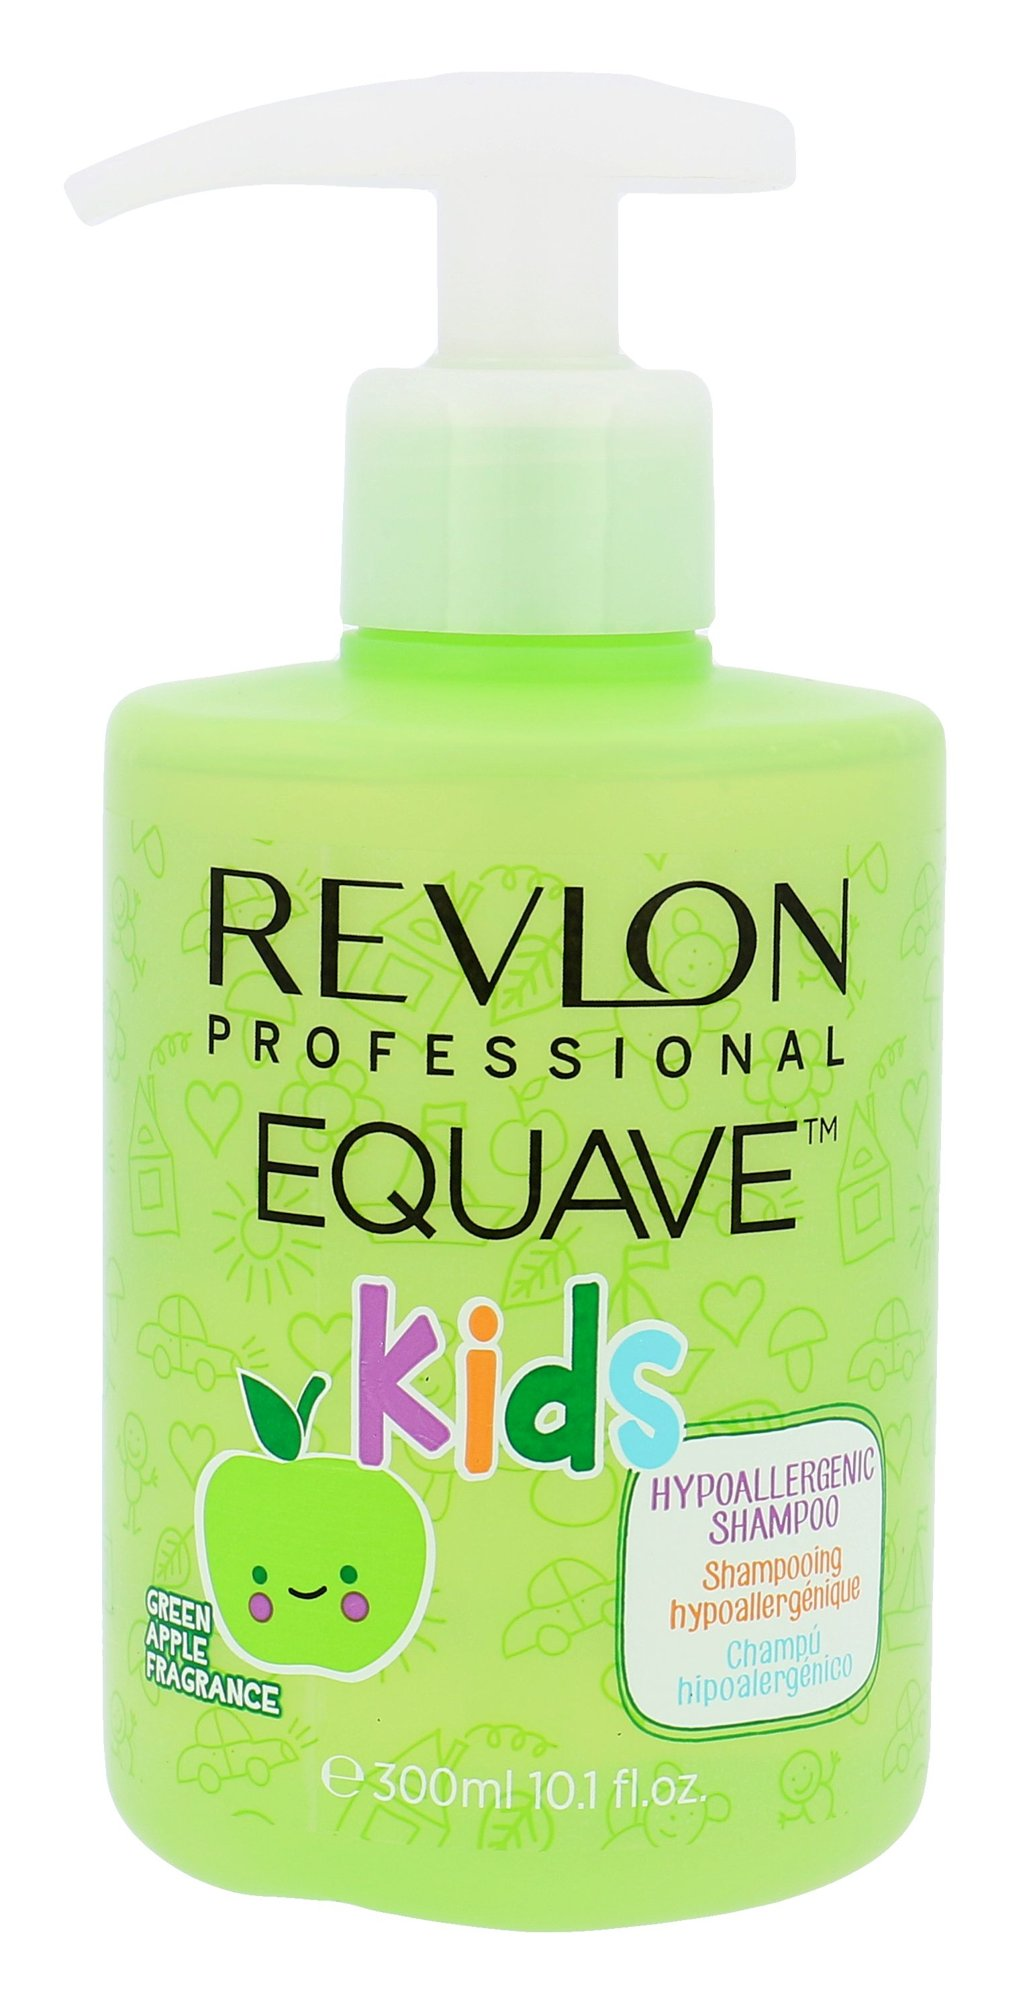 Revlon Professional Equave Cosmetic 300ml